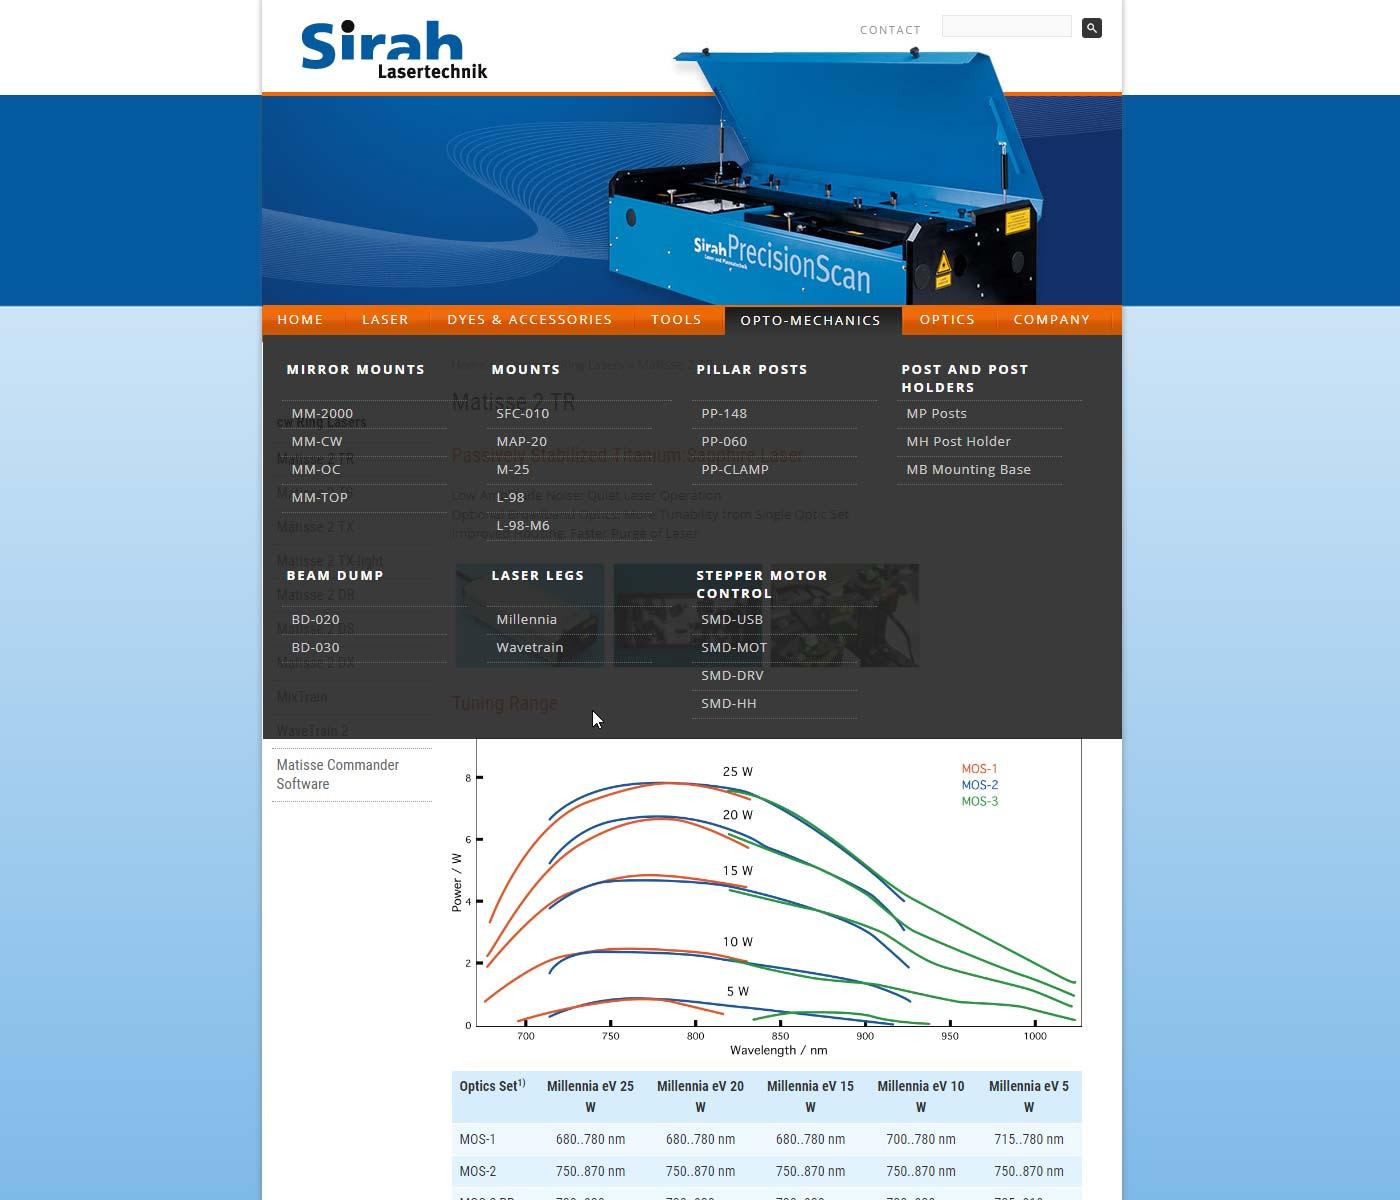 Sirah Lasertechnik - Website